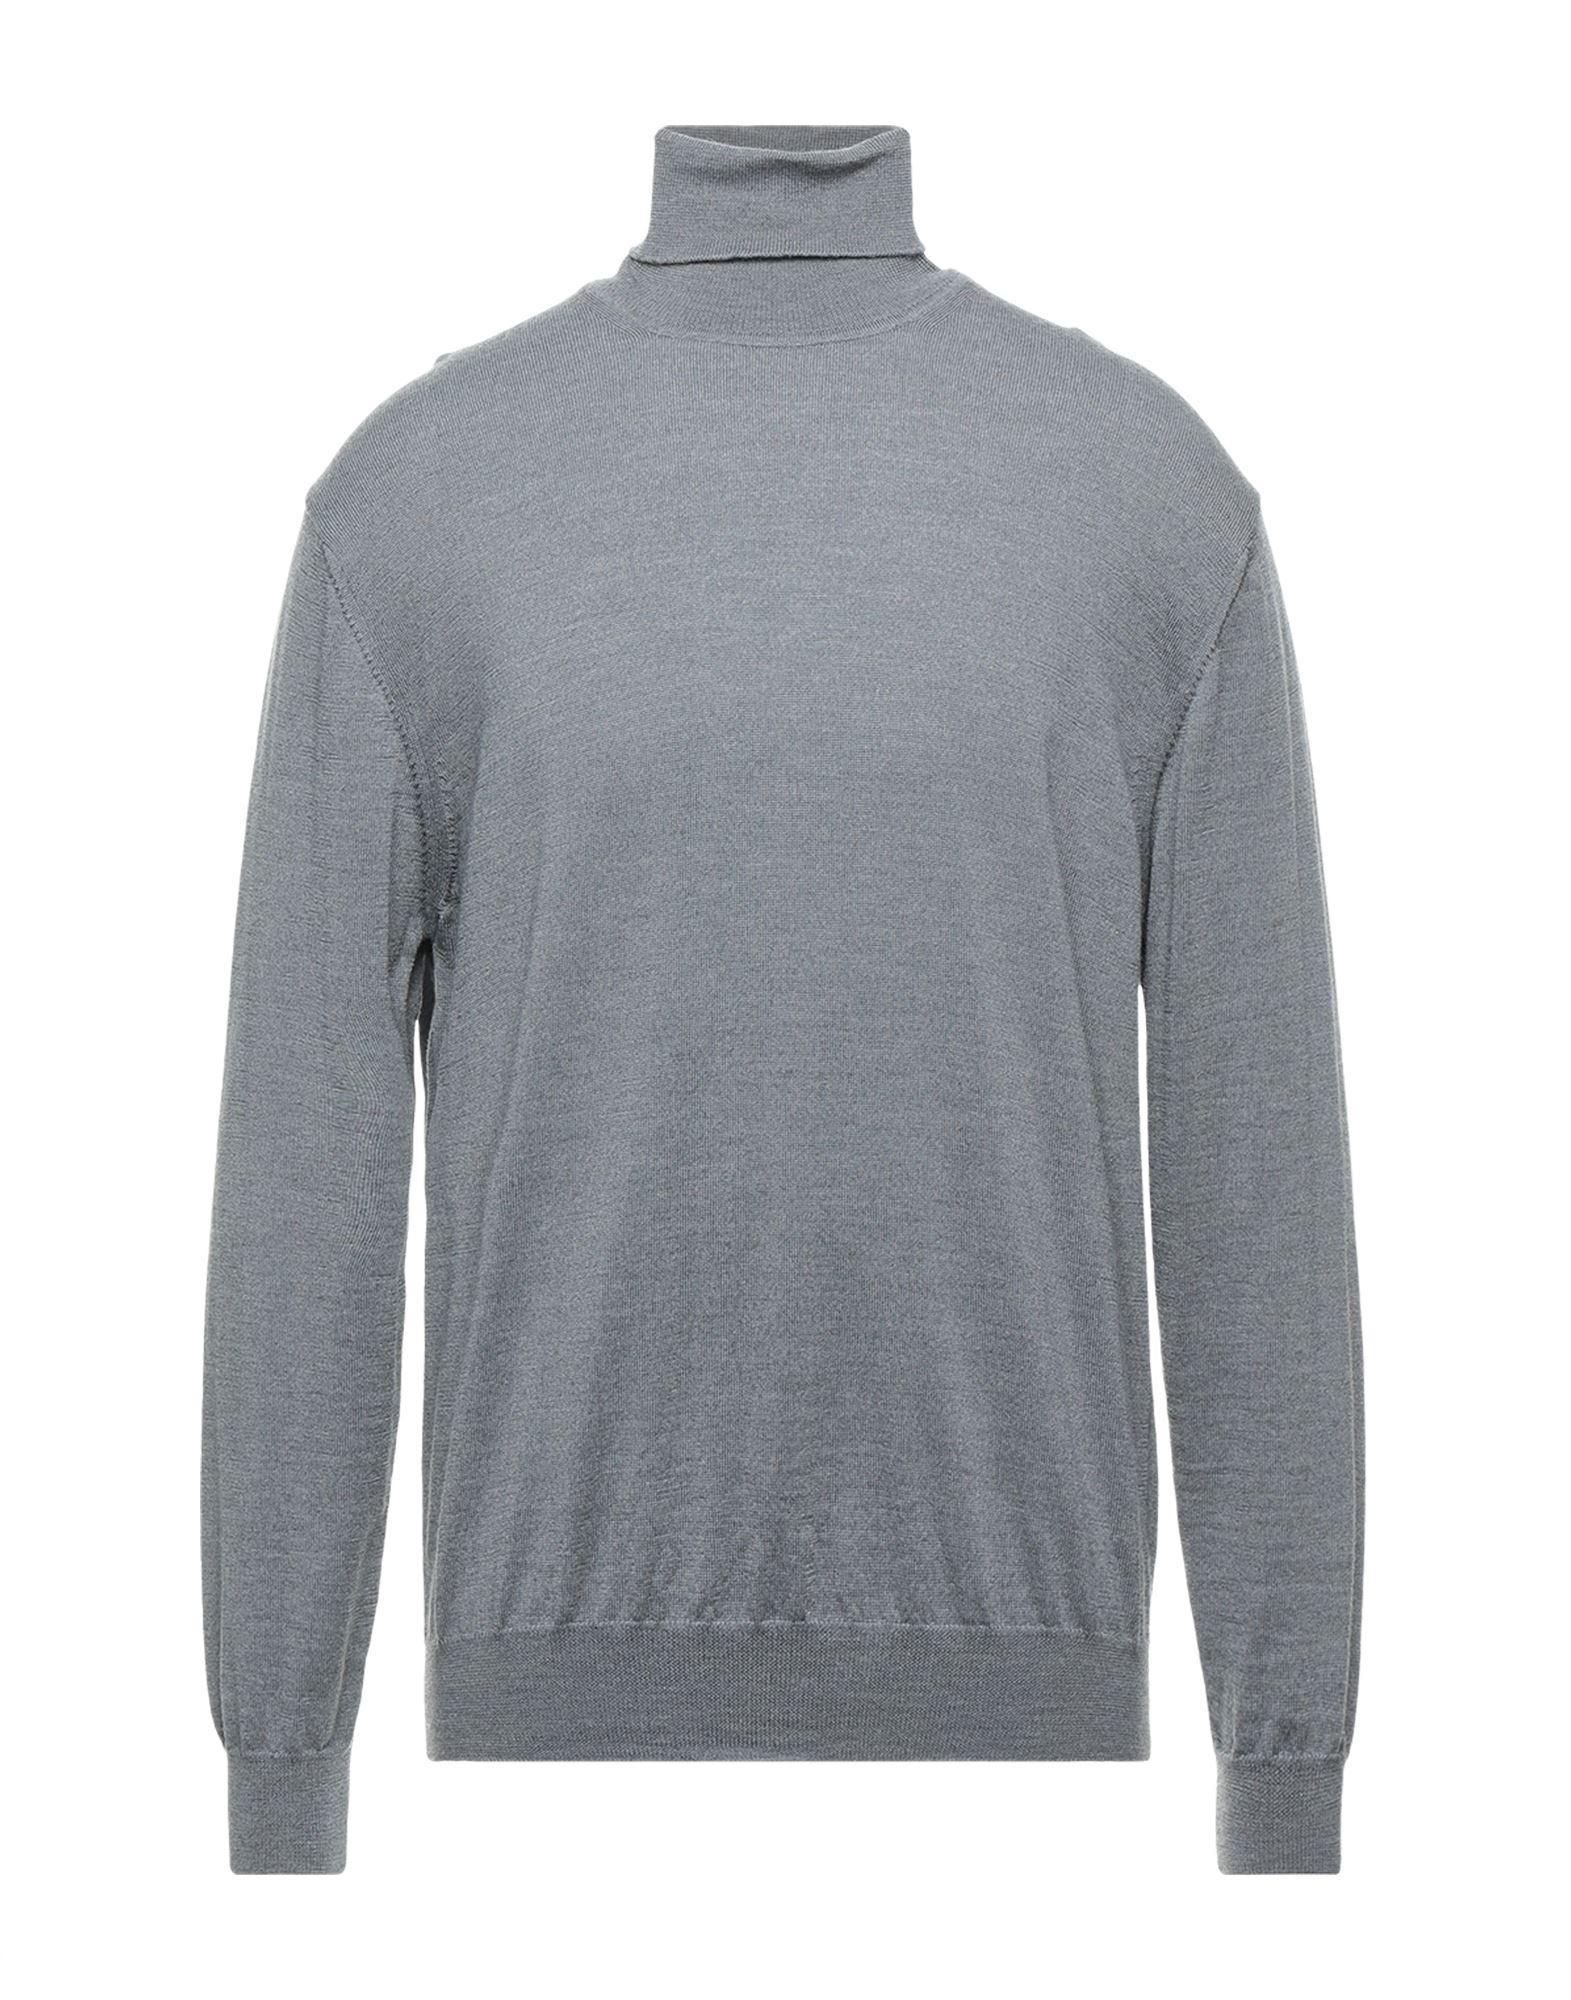 Acquapura Turtlenecks In Grey